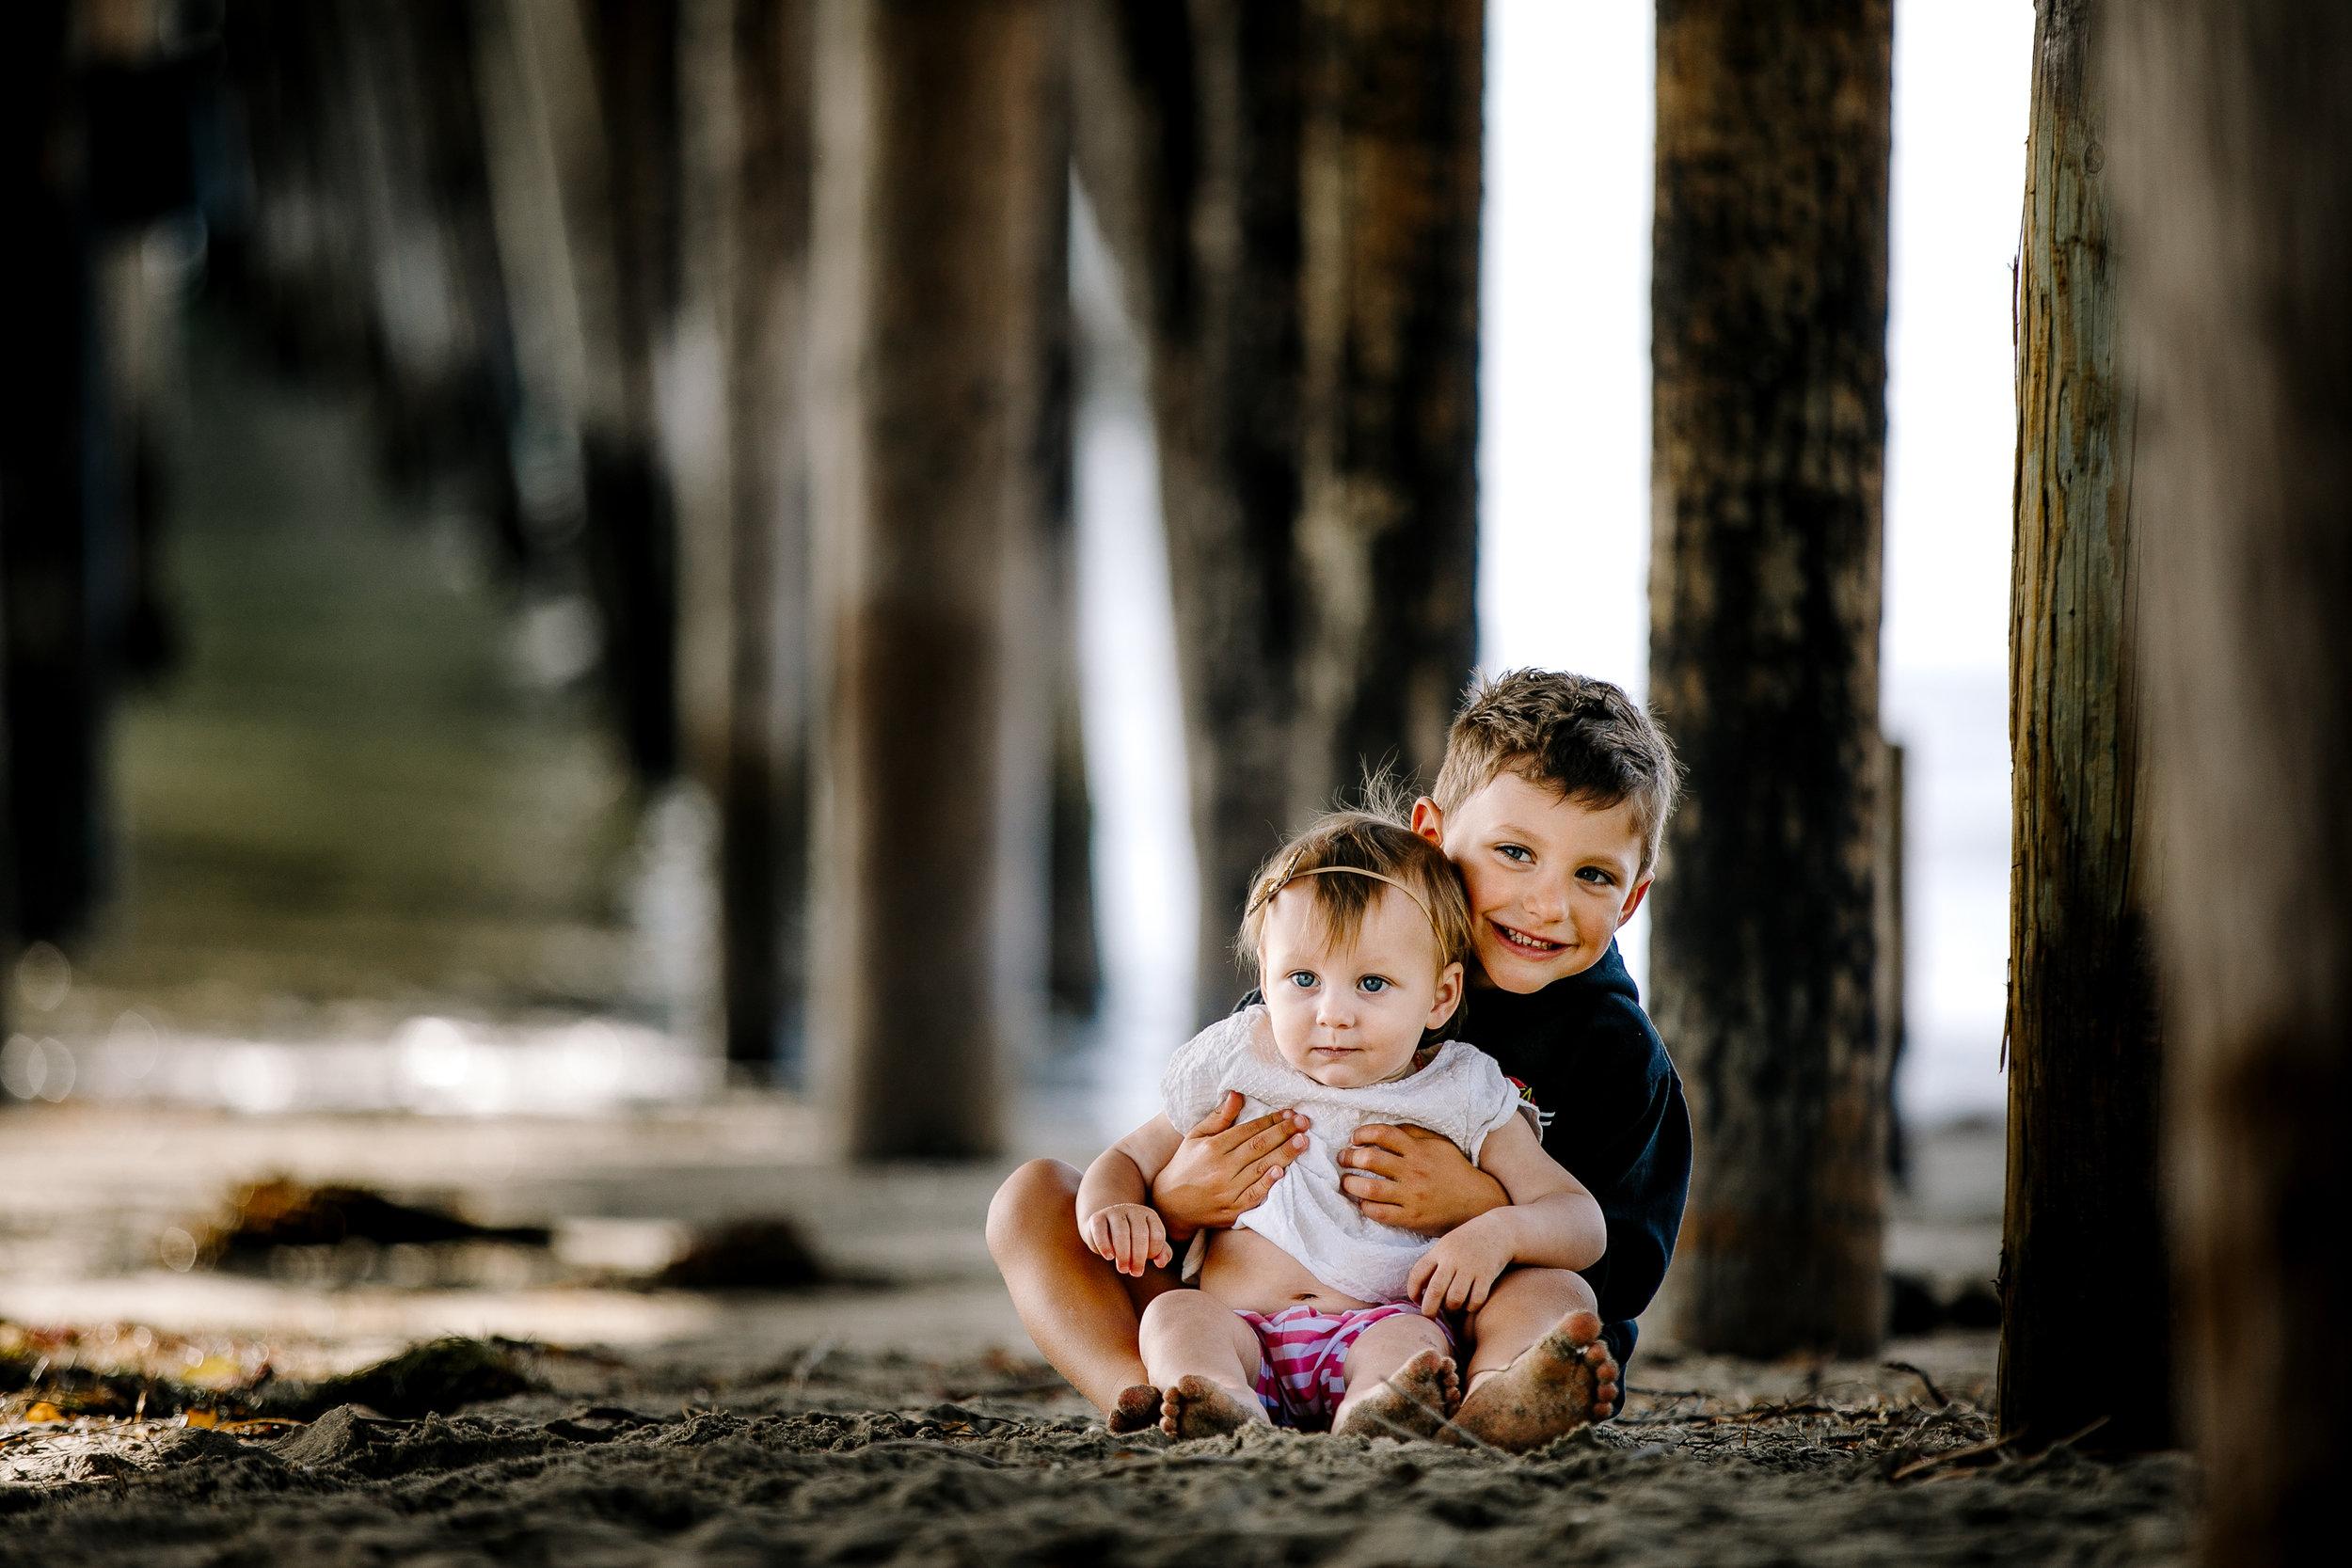 Archer Inspired Photography Lifestyle Family Capitola Beach California Documentary Photographer First Birthday Shoot-18.jpg